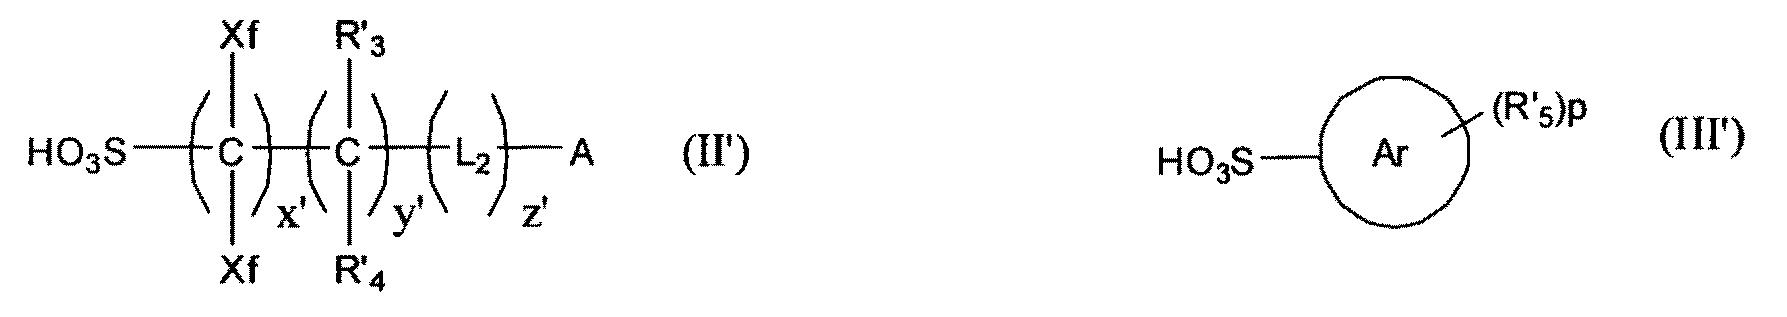 Figure 112011039817284-pct00045